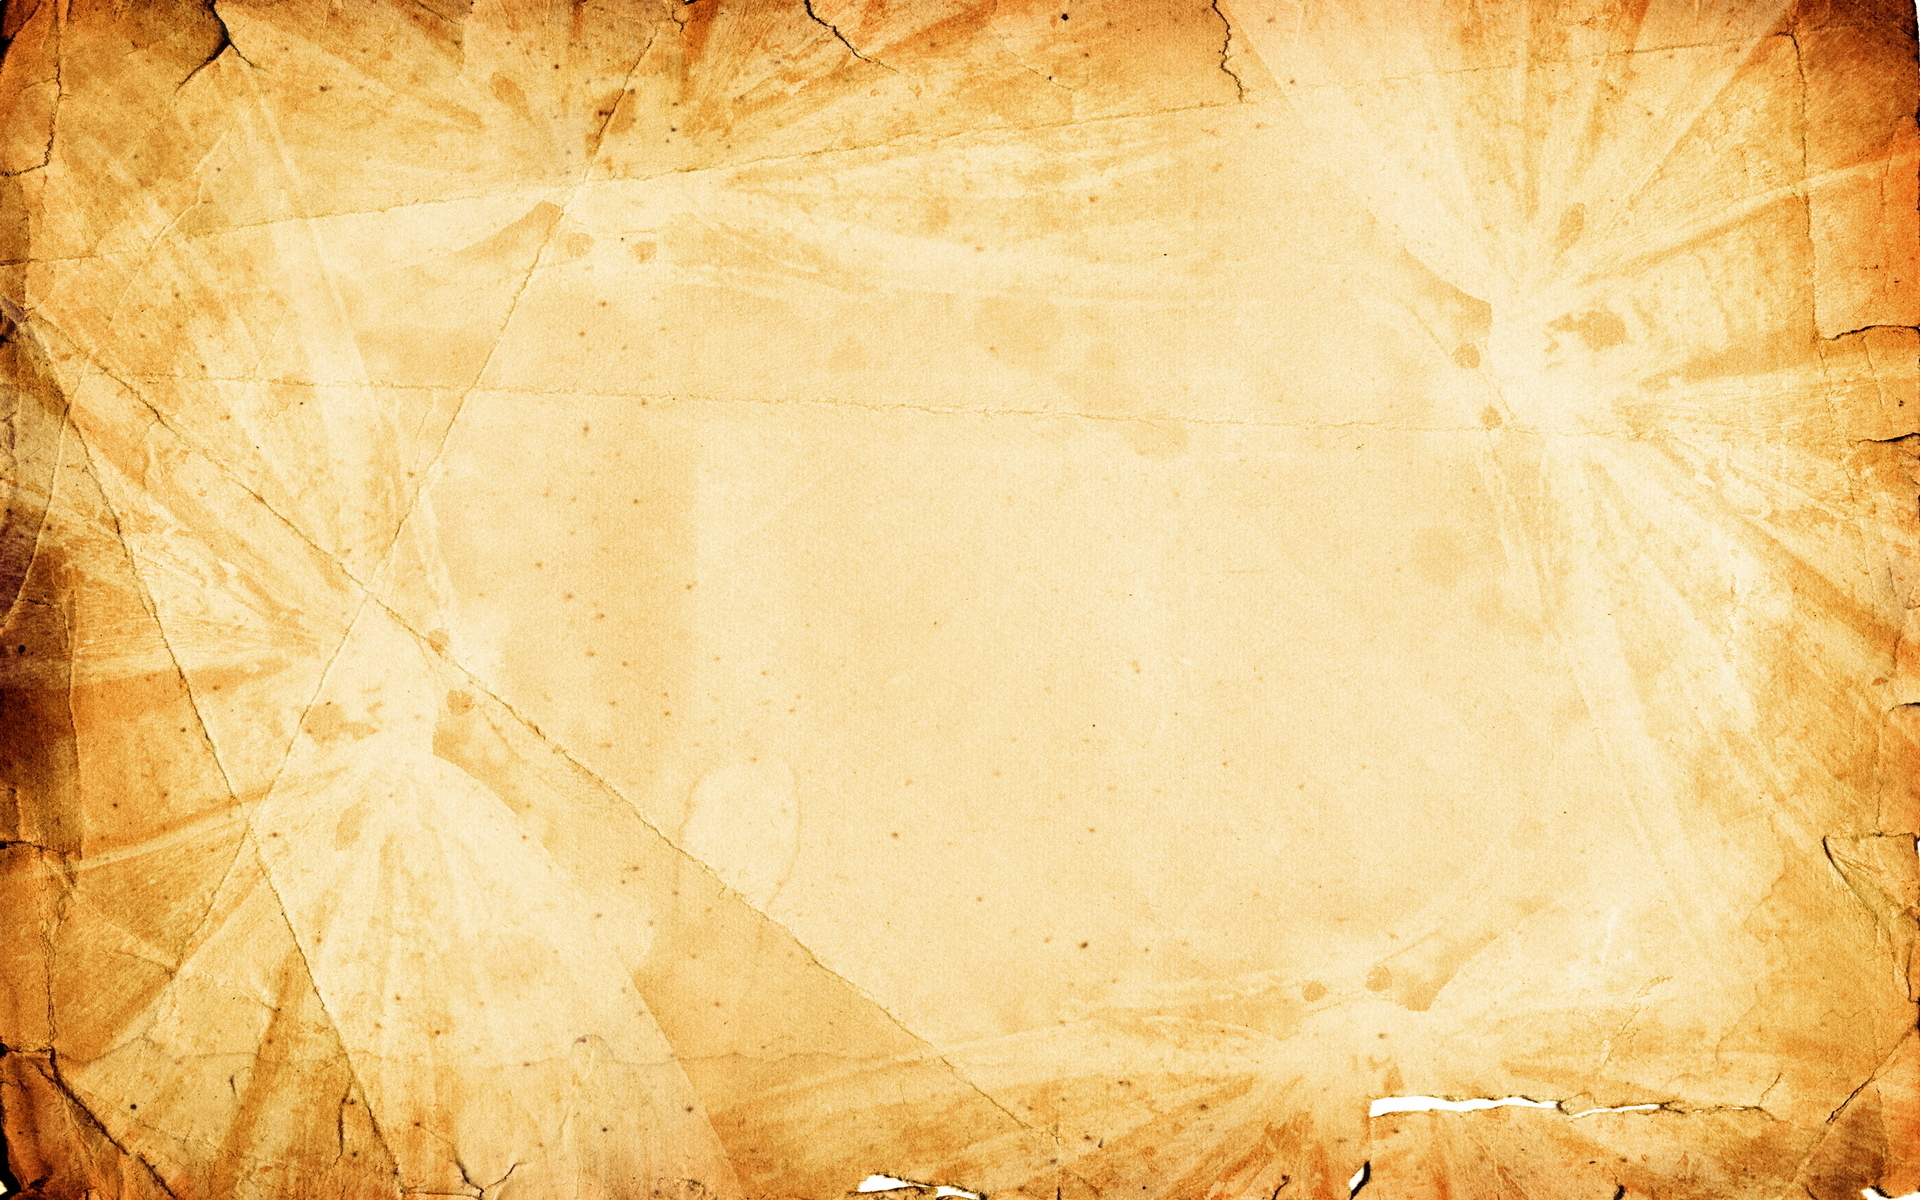 Fondos de pantalla Textura Hoja de papel marrón arrugado